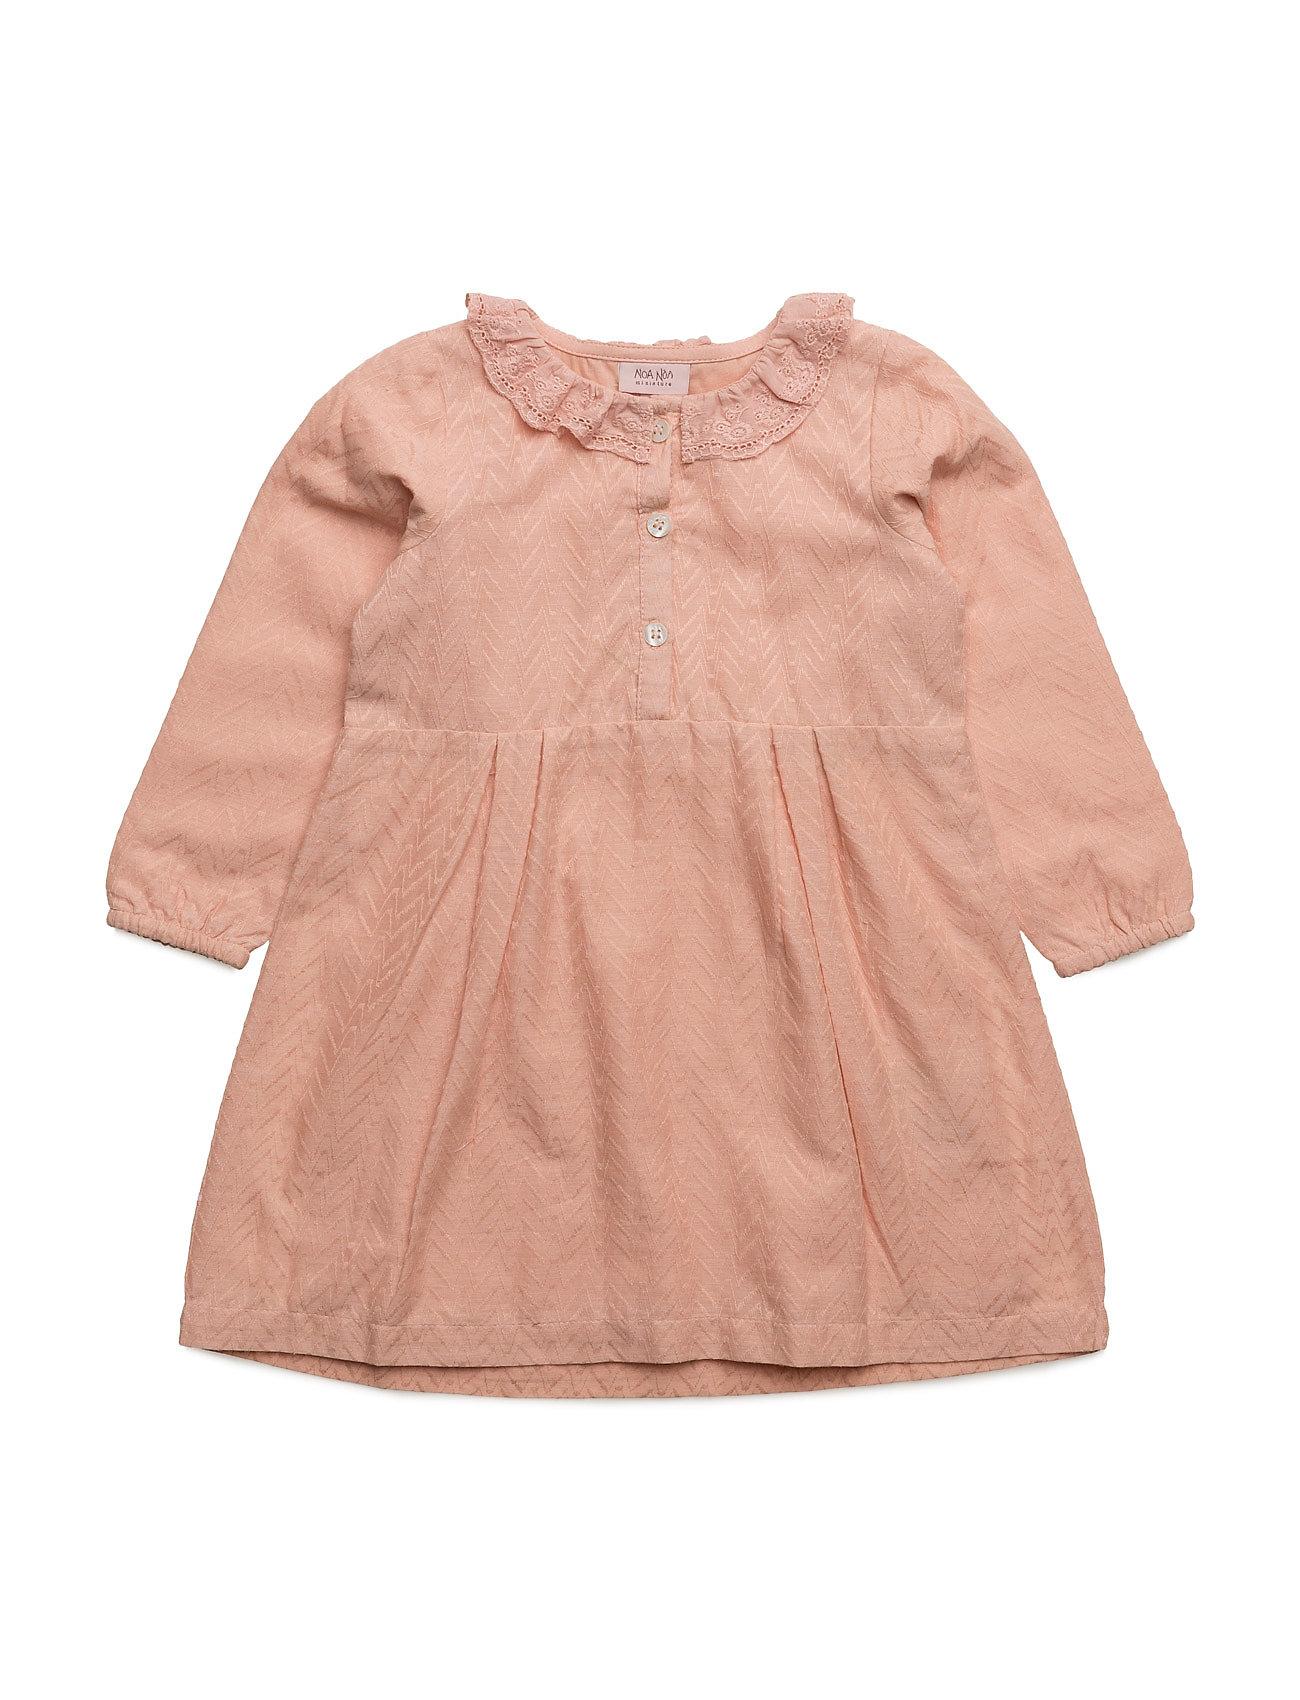 Dress Long Sleeve Noa Noa Miniature Kjoler til Børn i